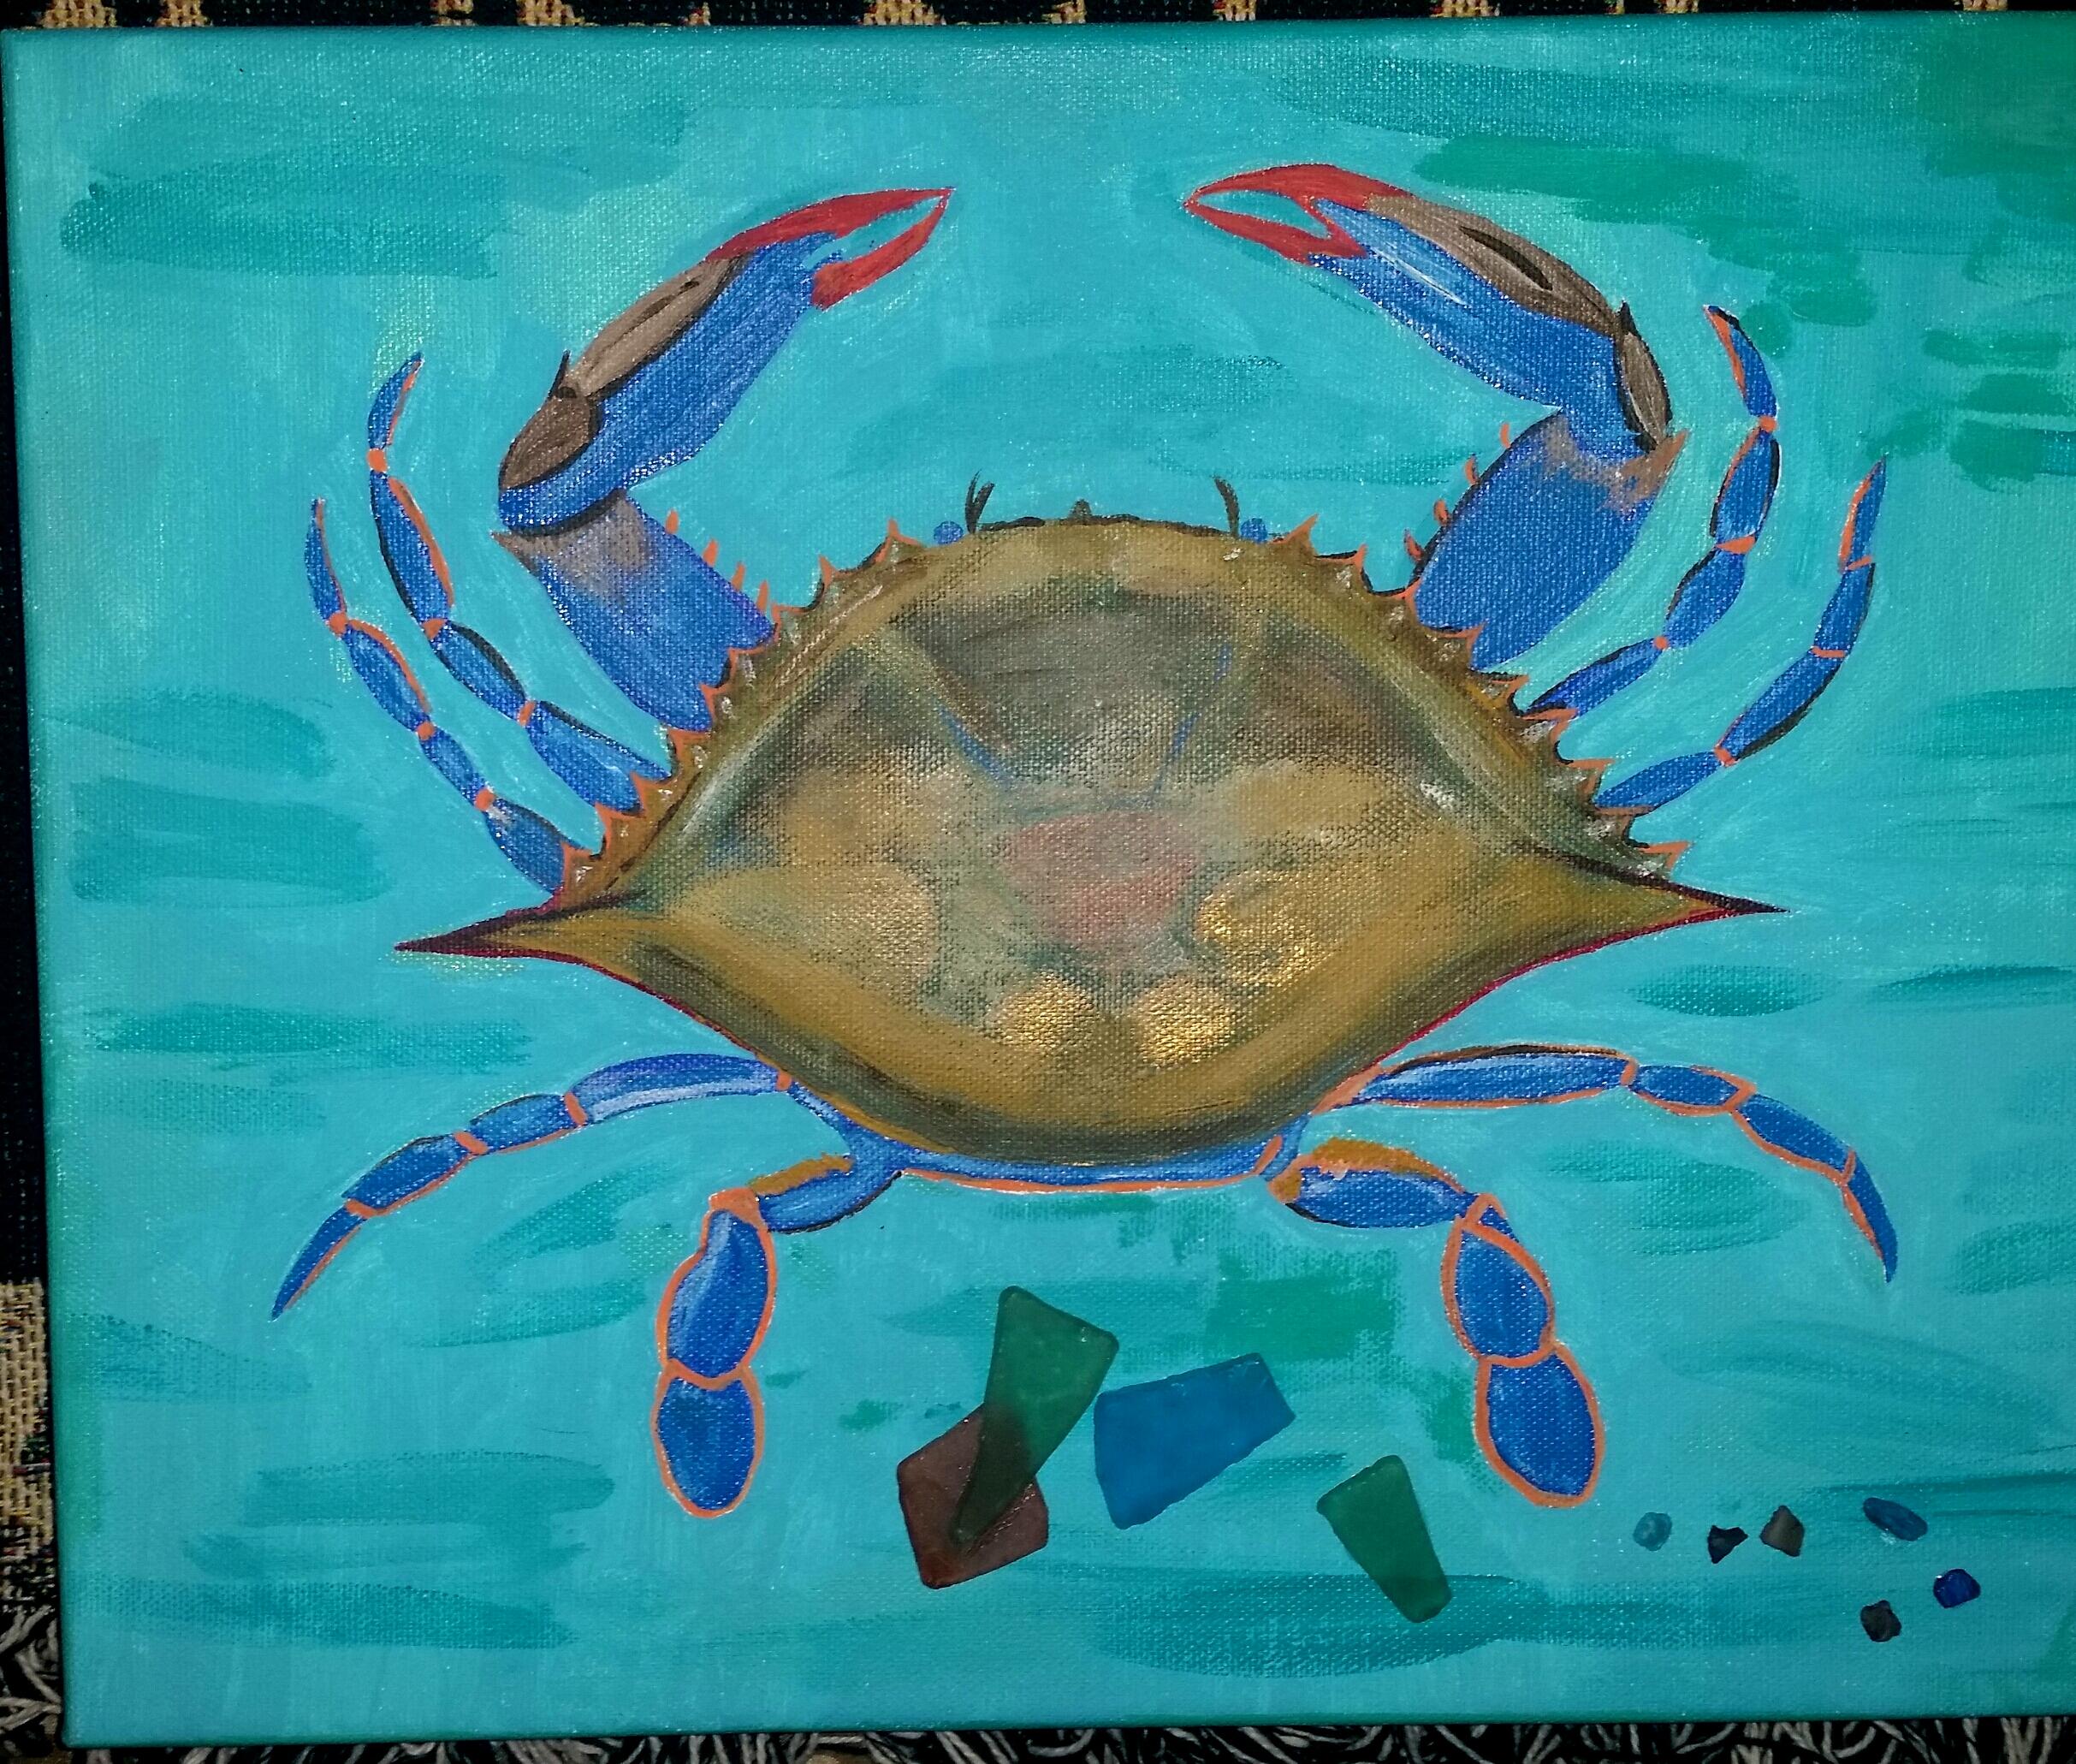 Blue-Crab-11-x-14-1